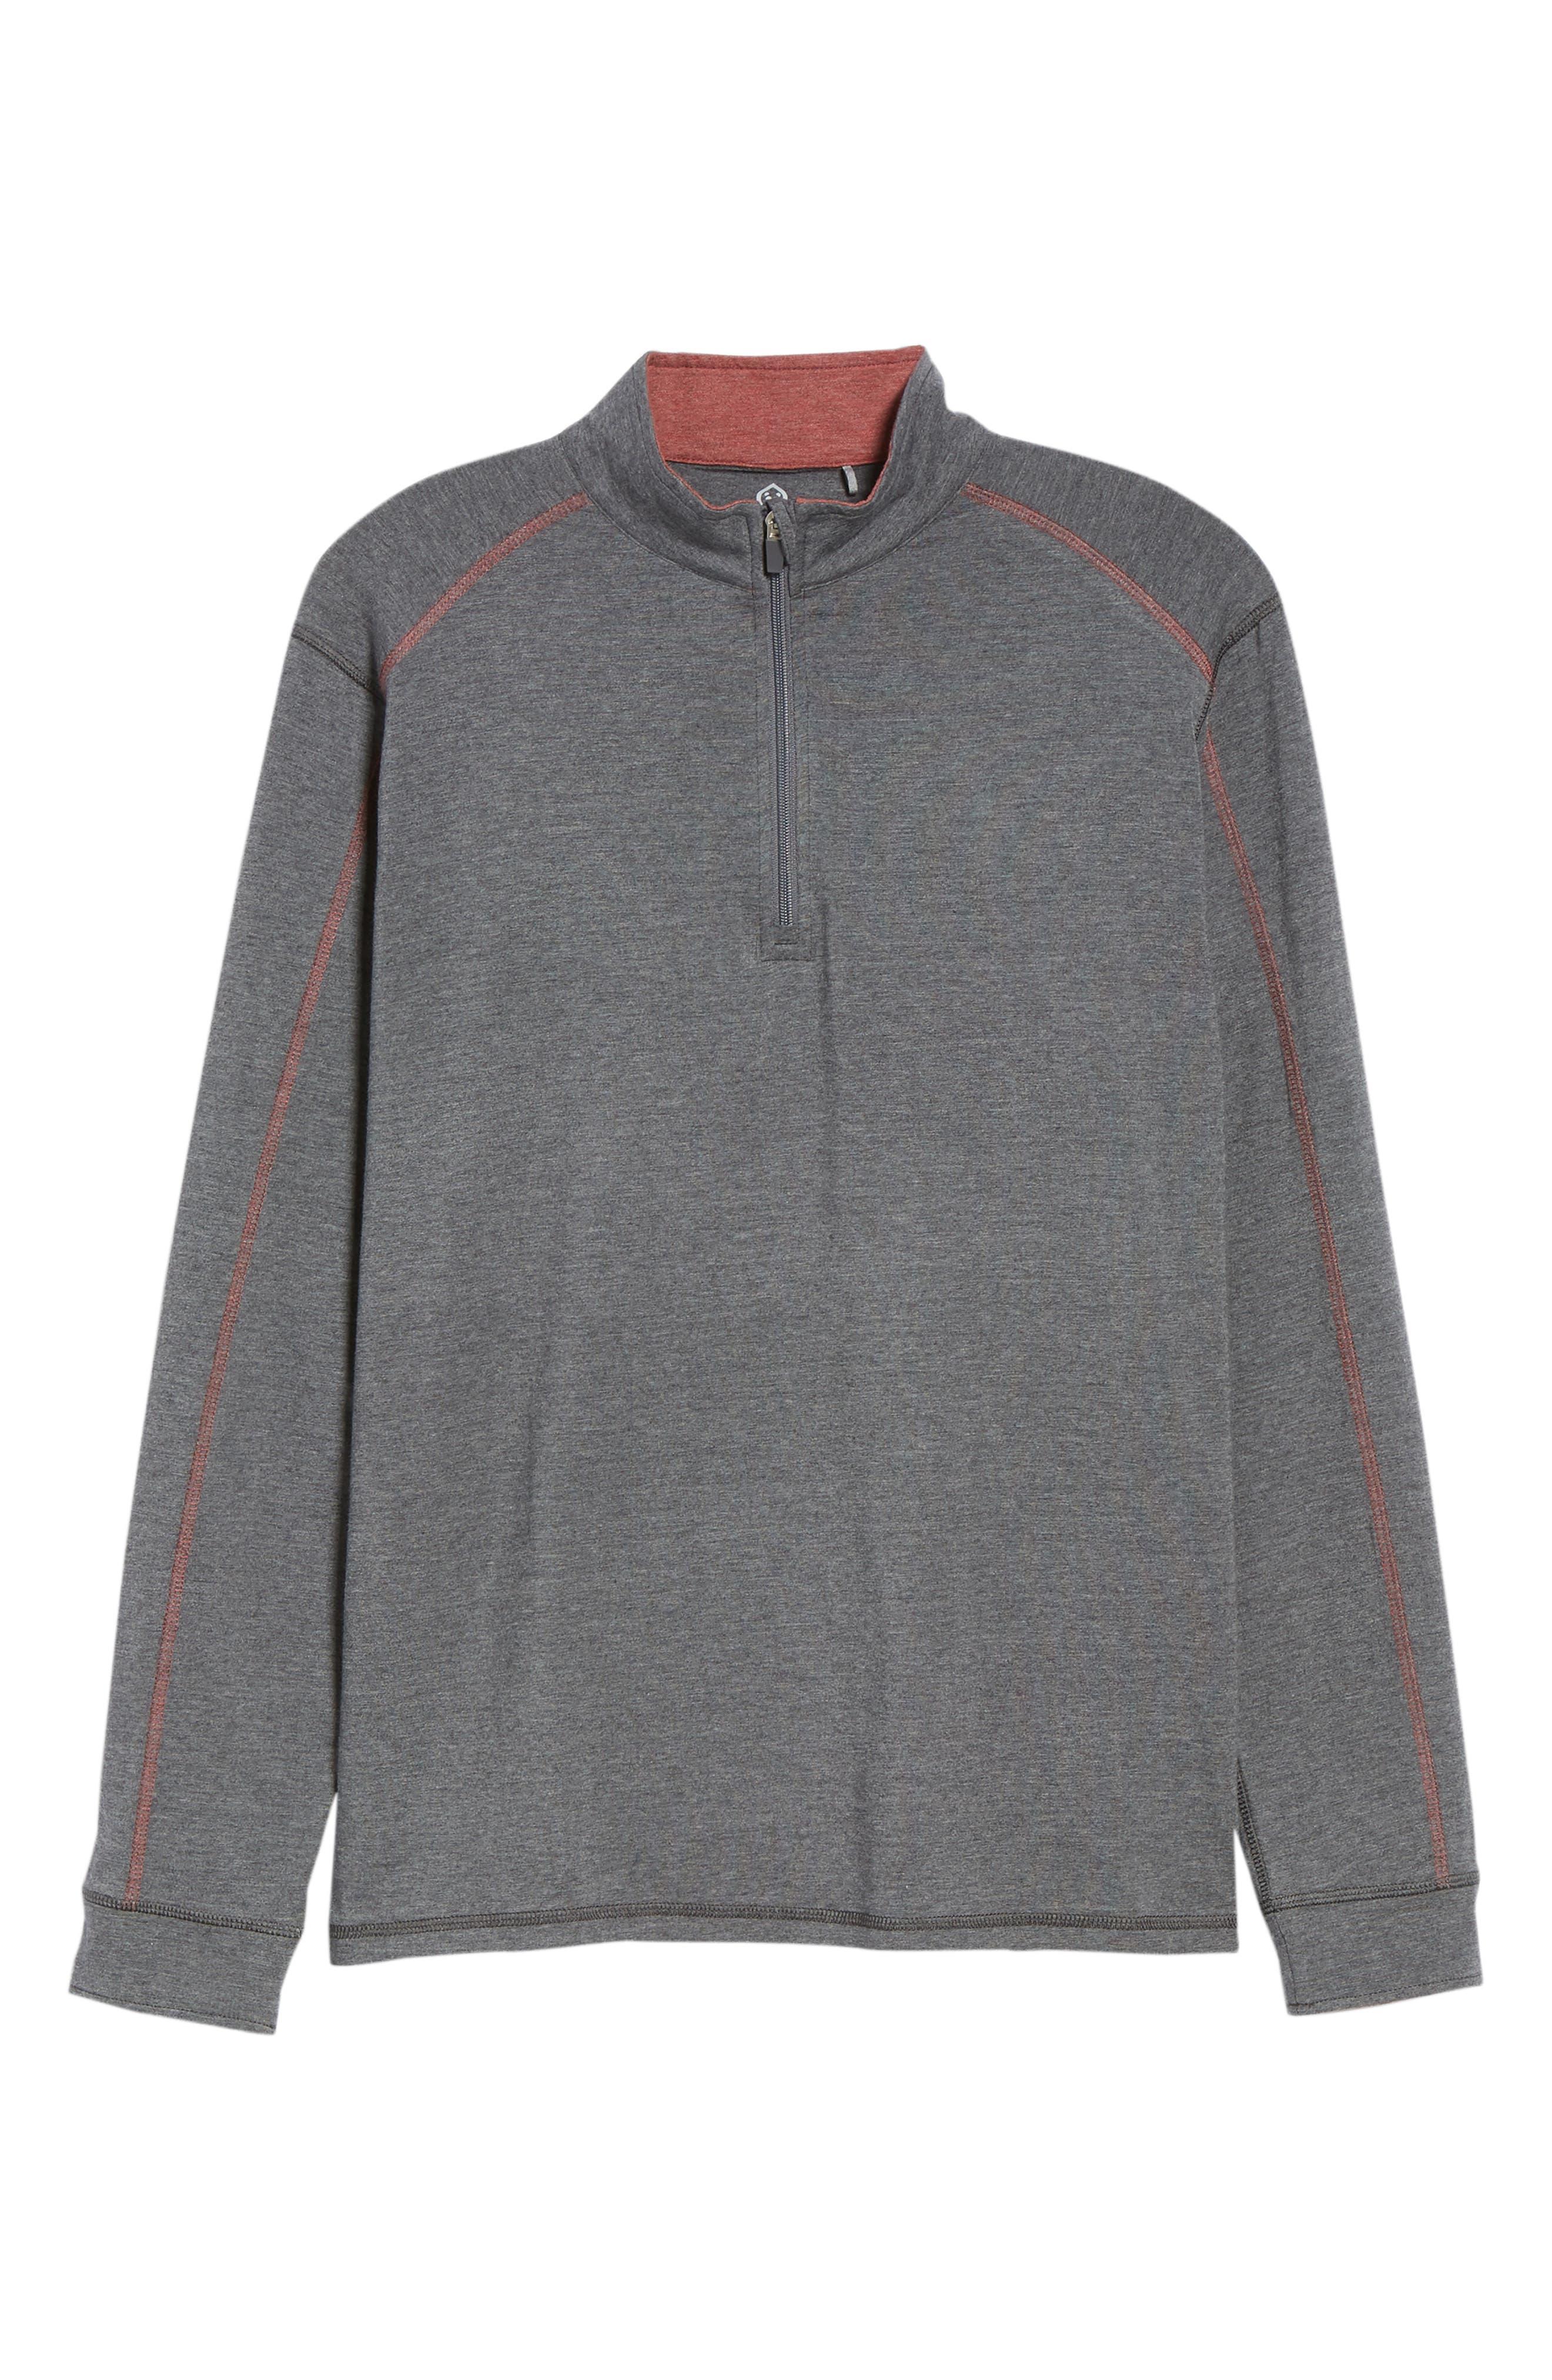 TASC PERFORMANCE, Carrollton Quarter Zip Sweatshirt, Alternate thumbnail 6, color, BLACK HEATHER/ MERCURY